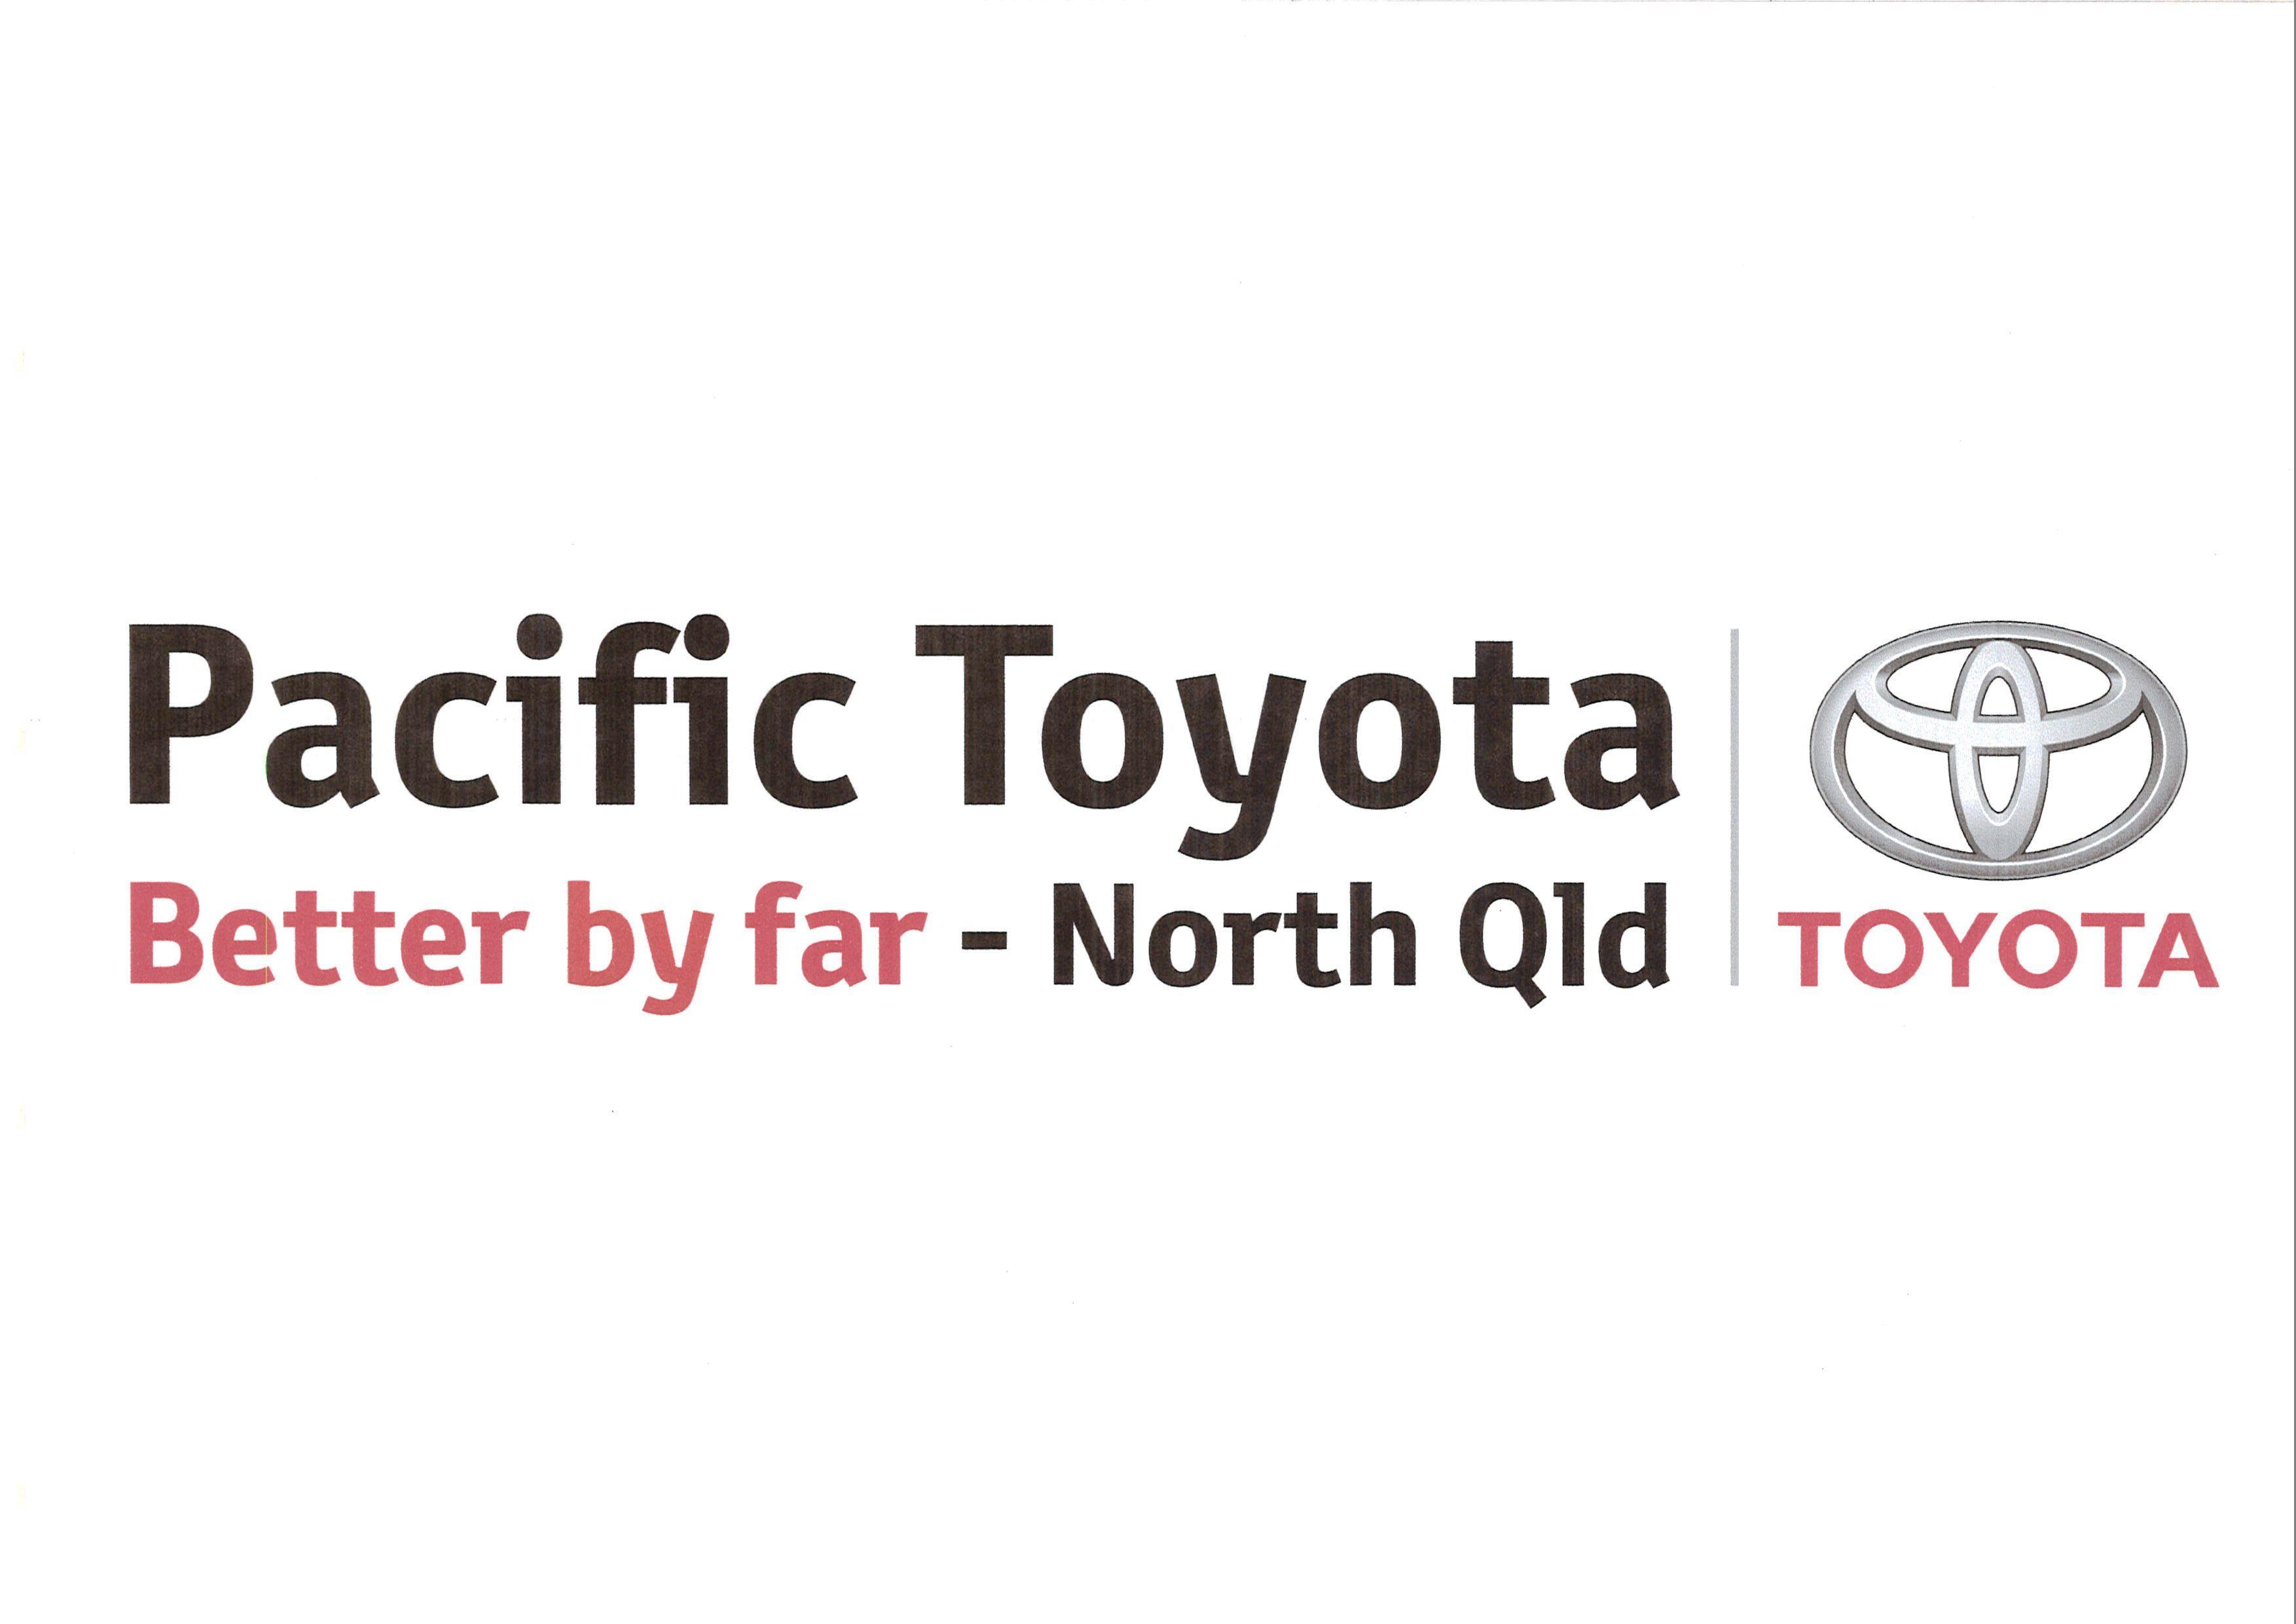 Pacific Toyota